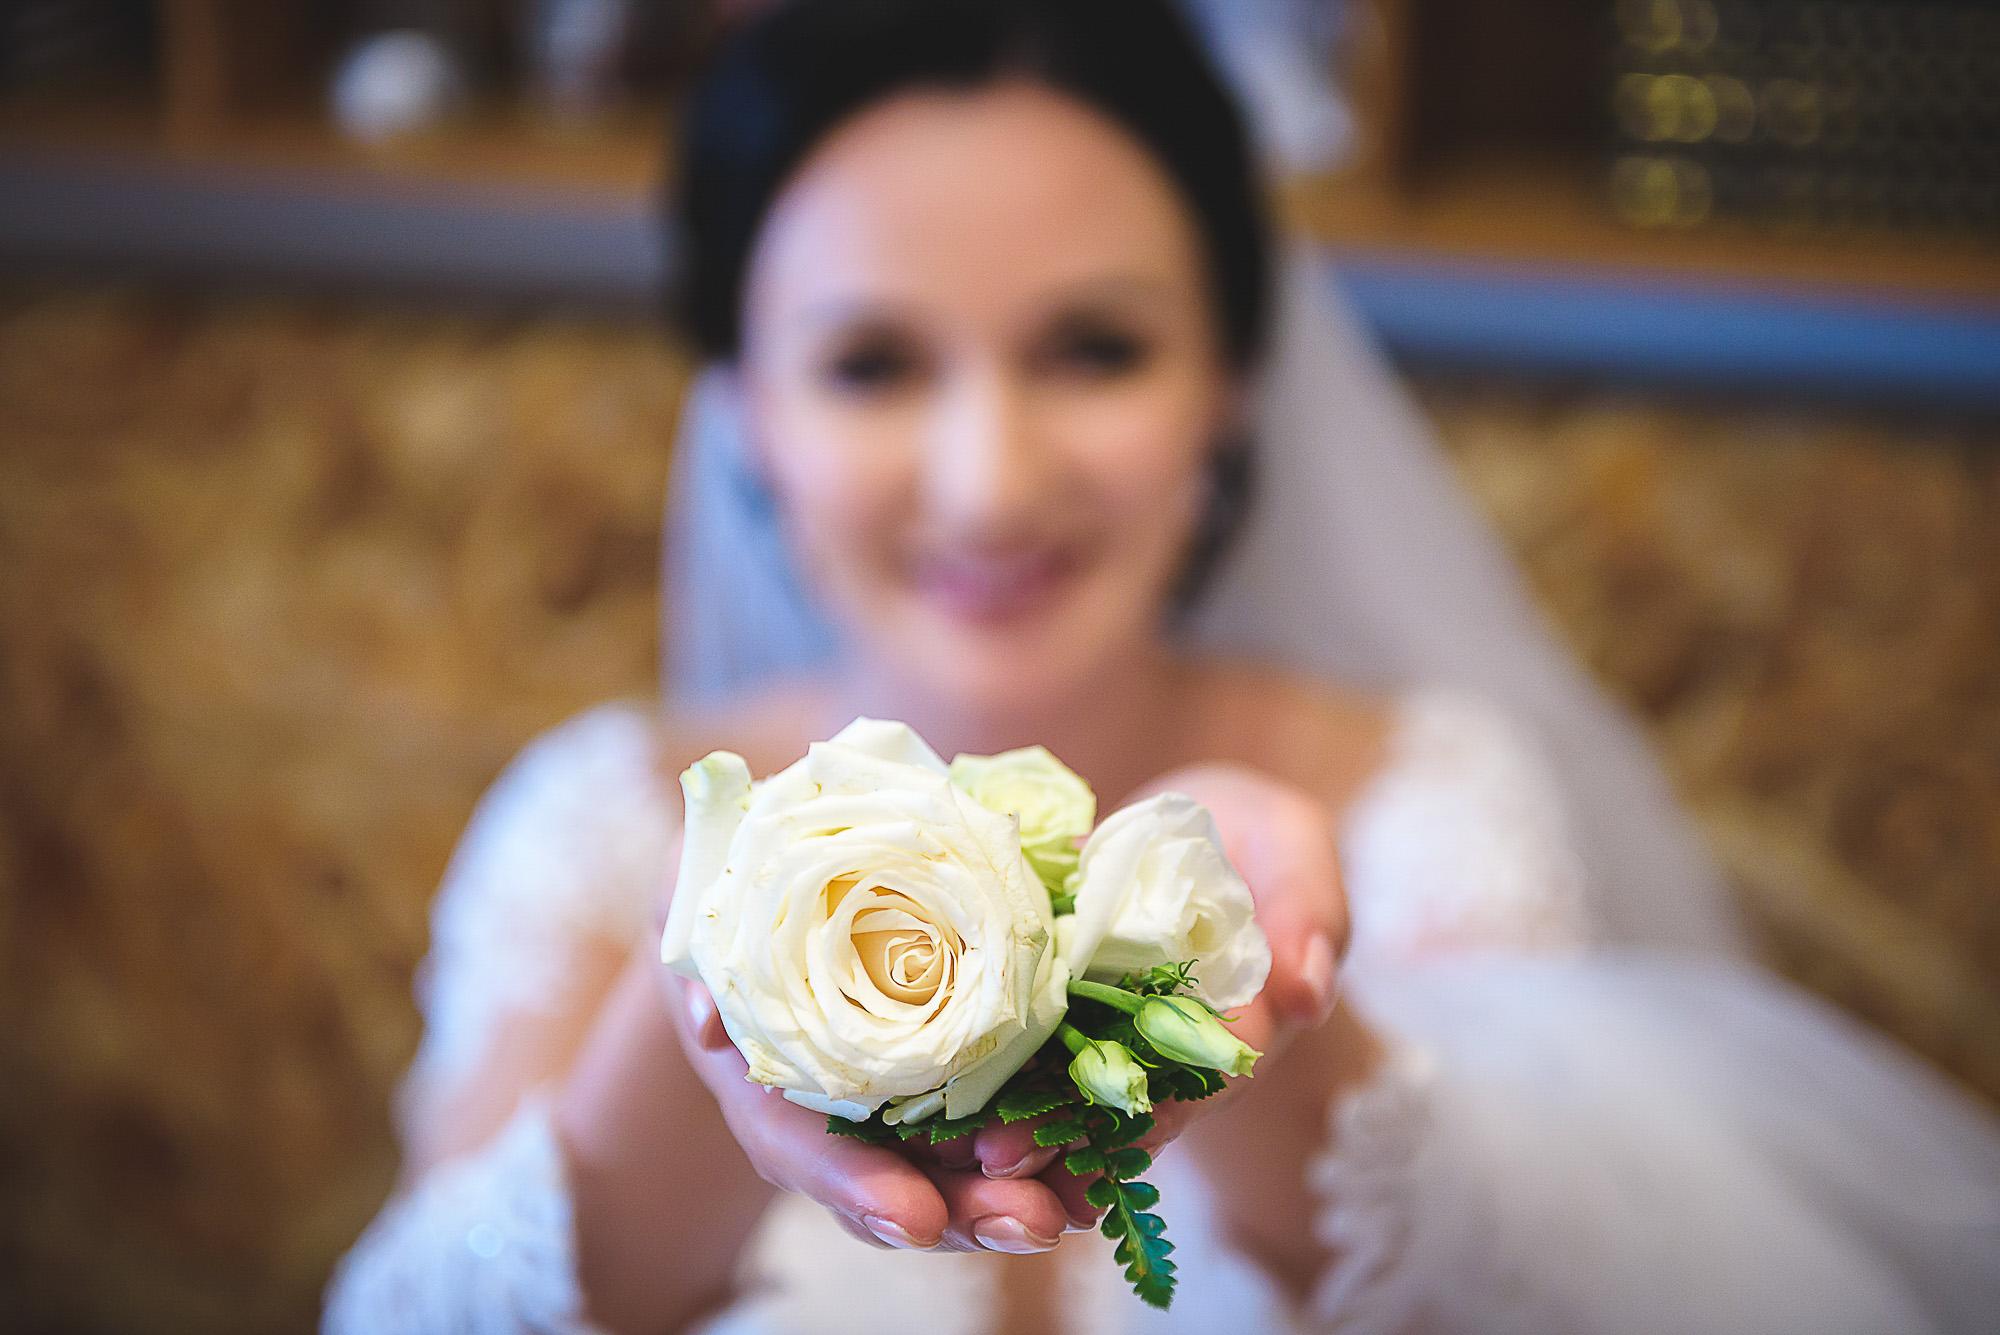 fotografie creativa de nunta, fotograf nunta mures, foto nunta reghin, pregatirile miresei, buchet mireasa, cocarda mirelui